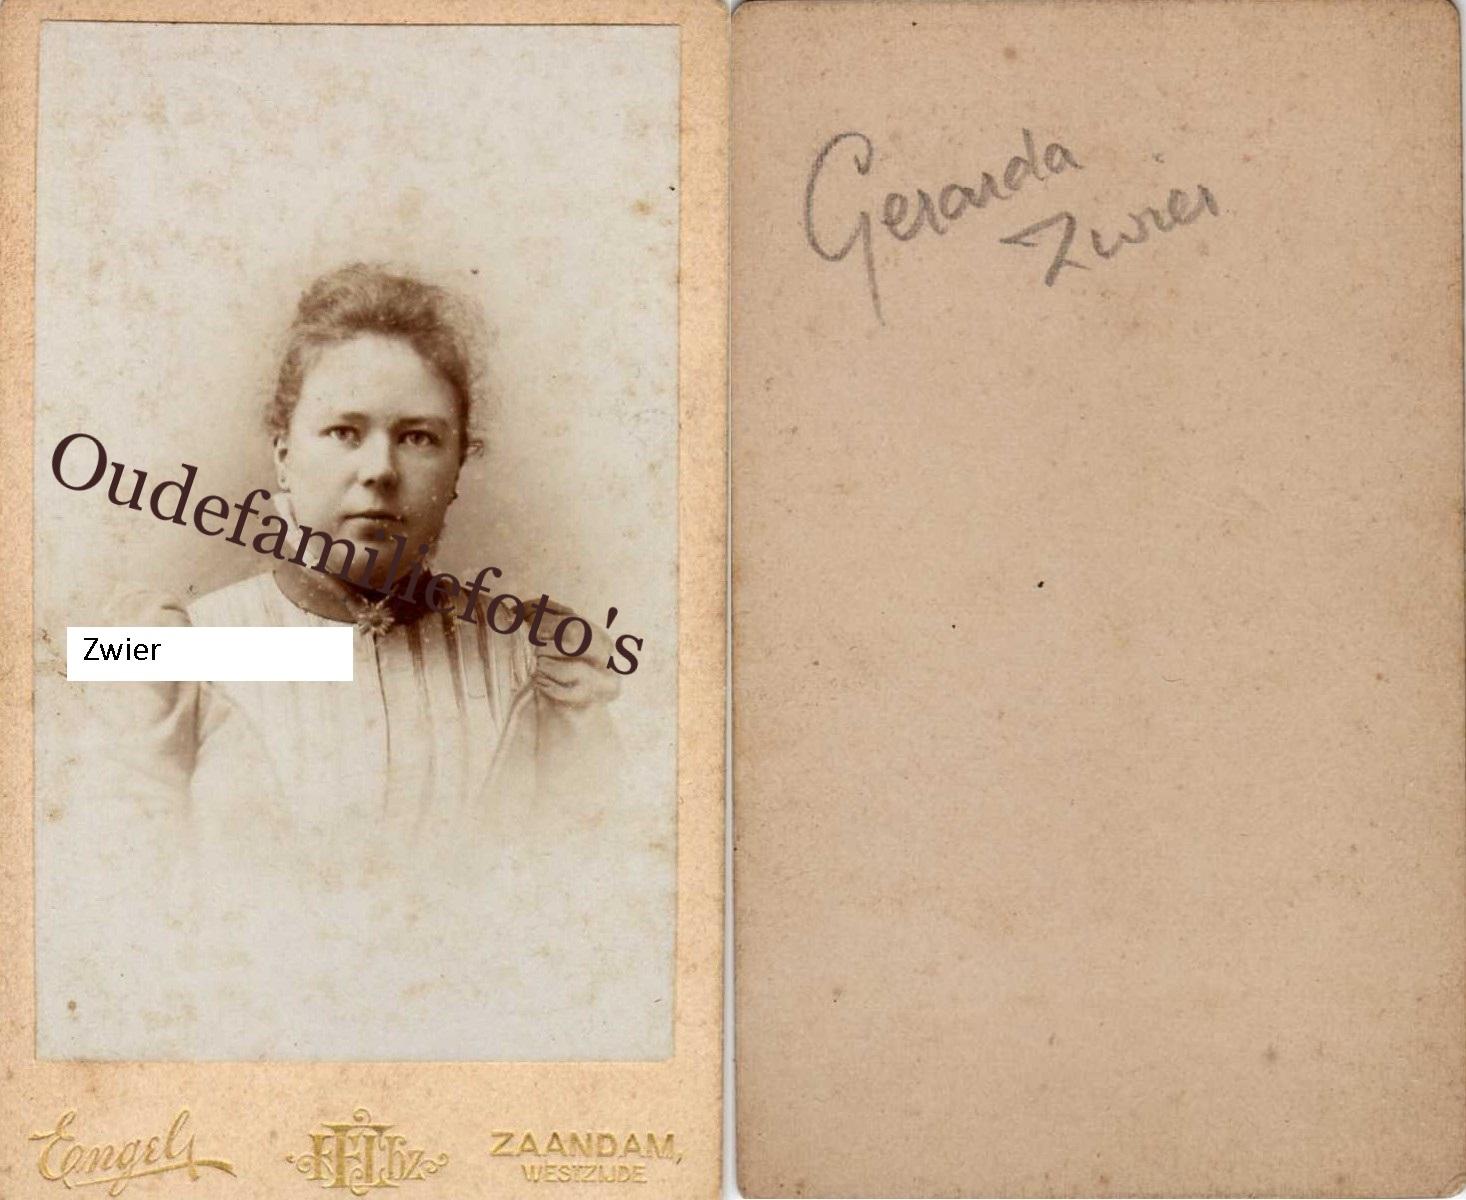 Zwier, Gerarda Hendrika Geb 25-10-1872 Amersfoort Ovl. 17-3-1942 Amersfoort € 3,00